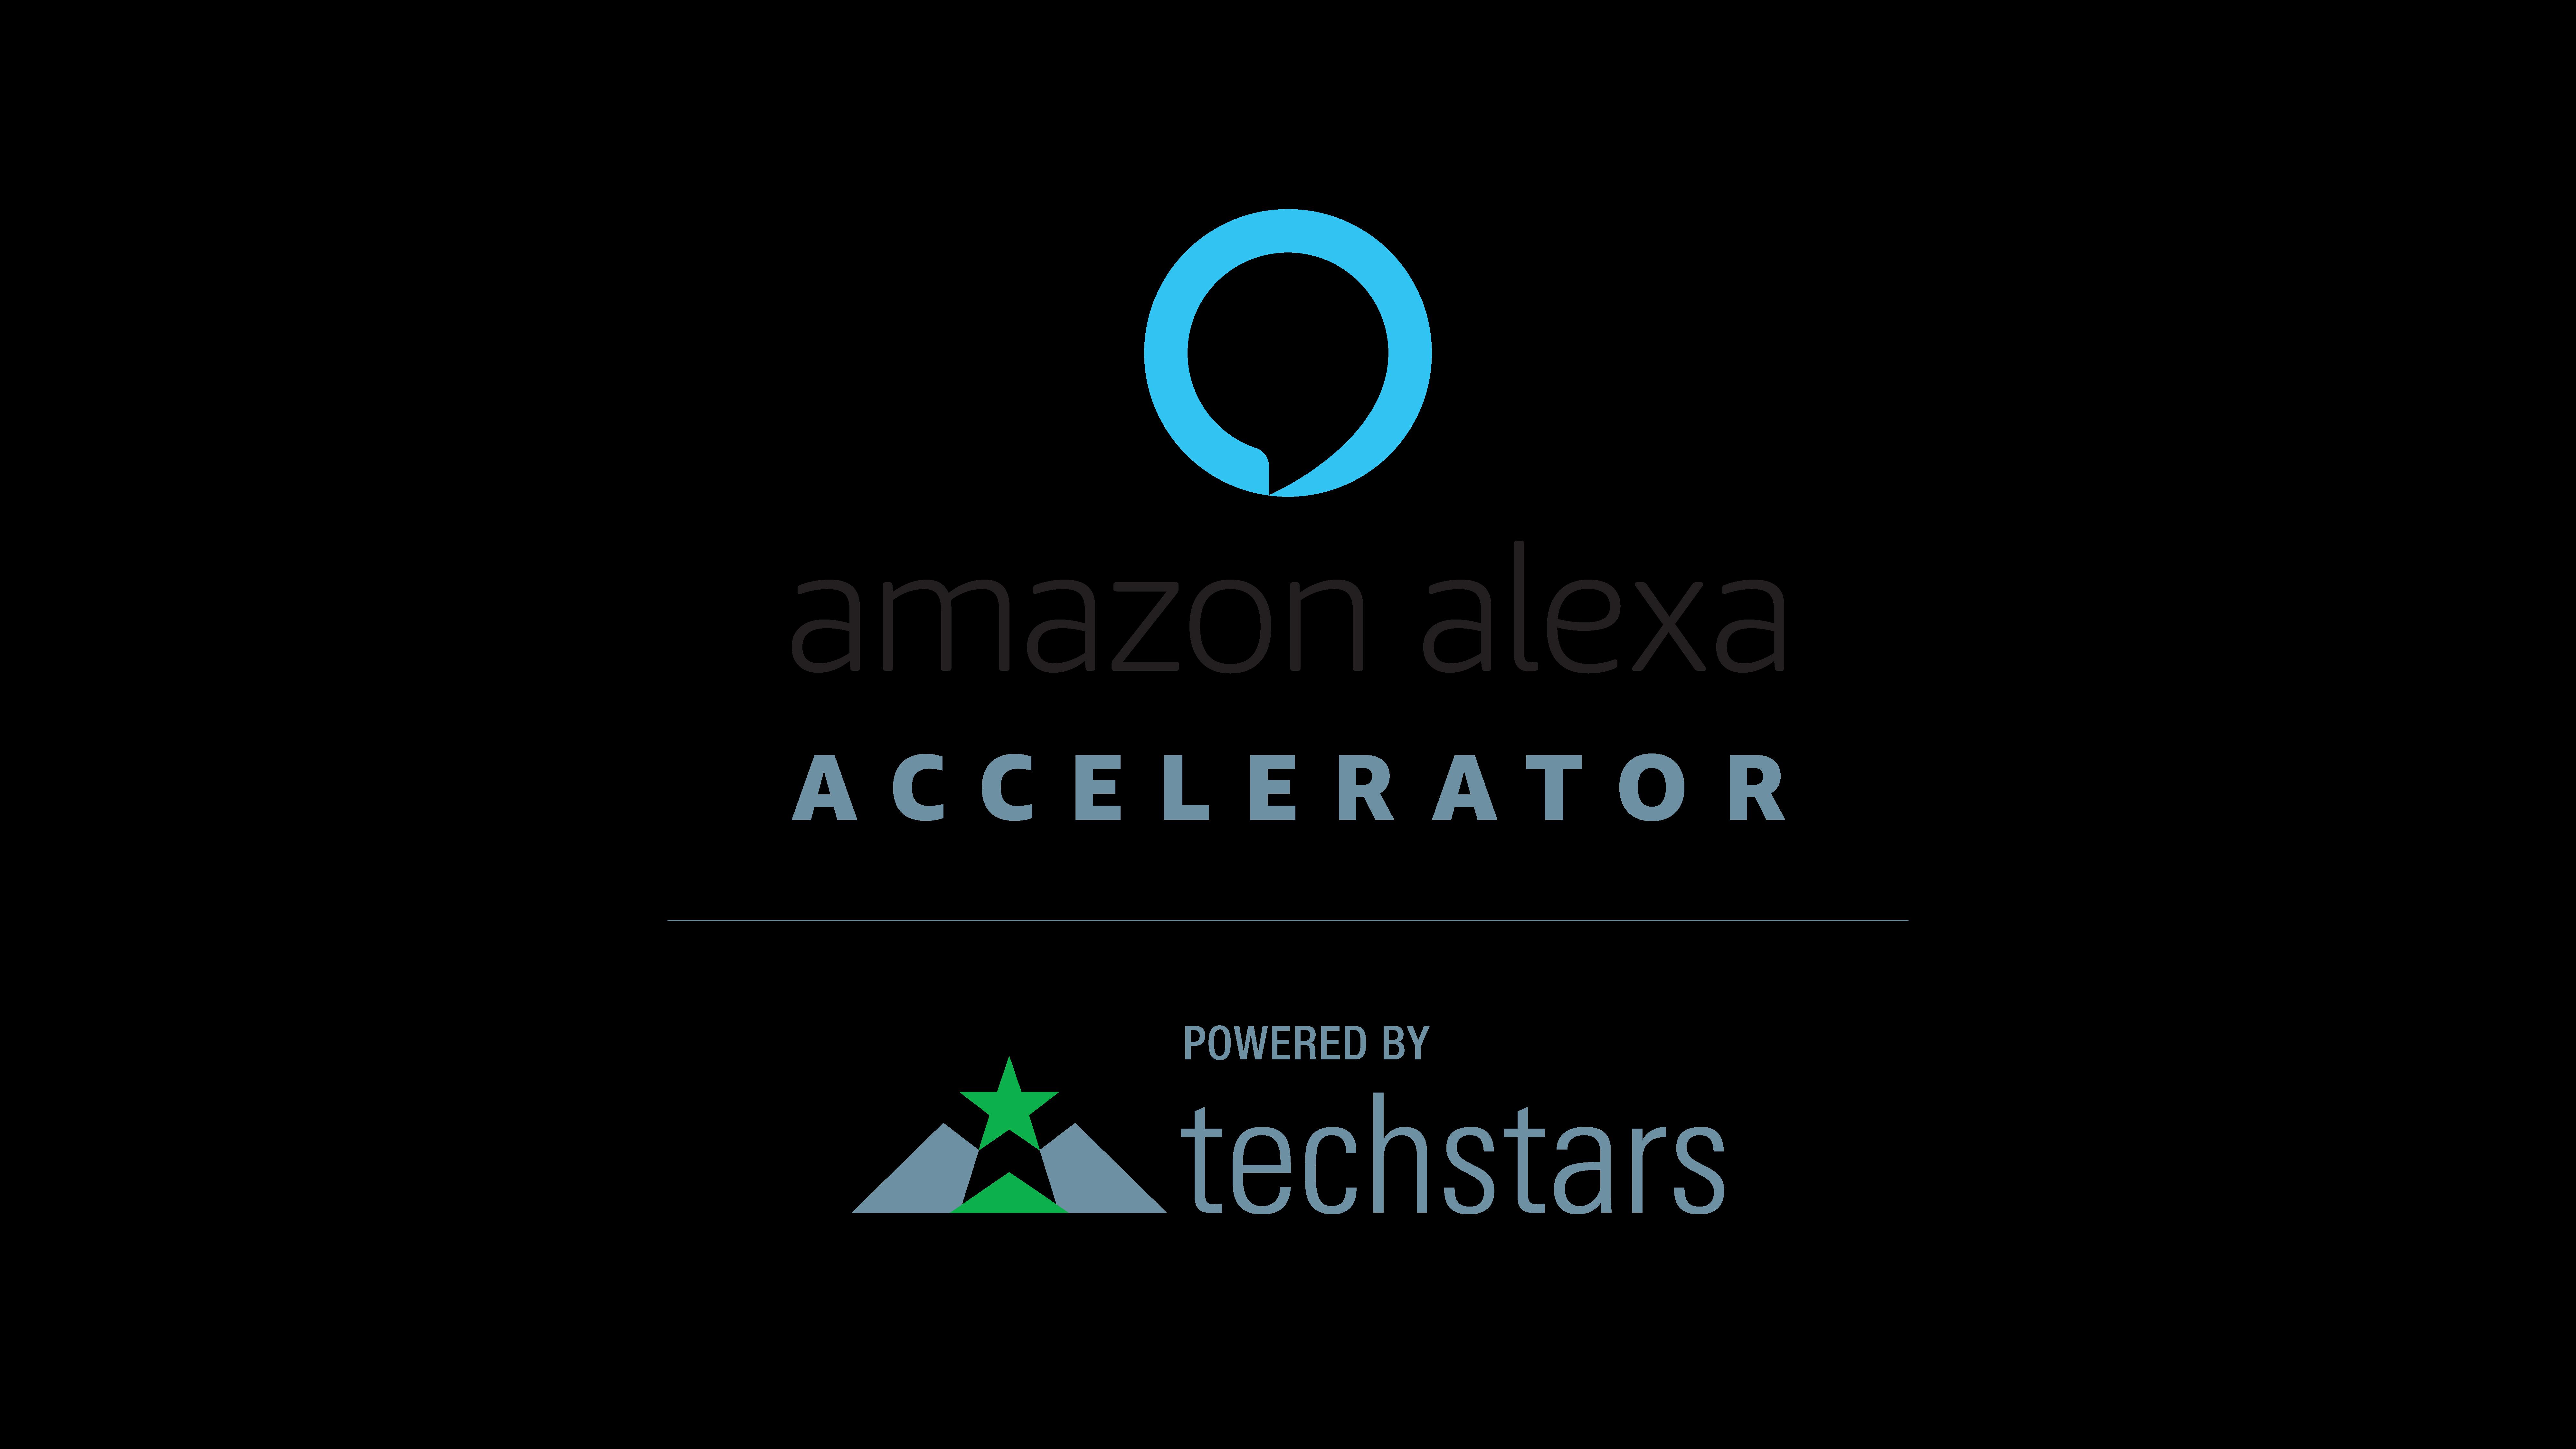 alexa-accelerator_lockup_light(2).png